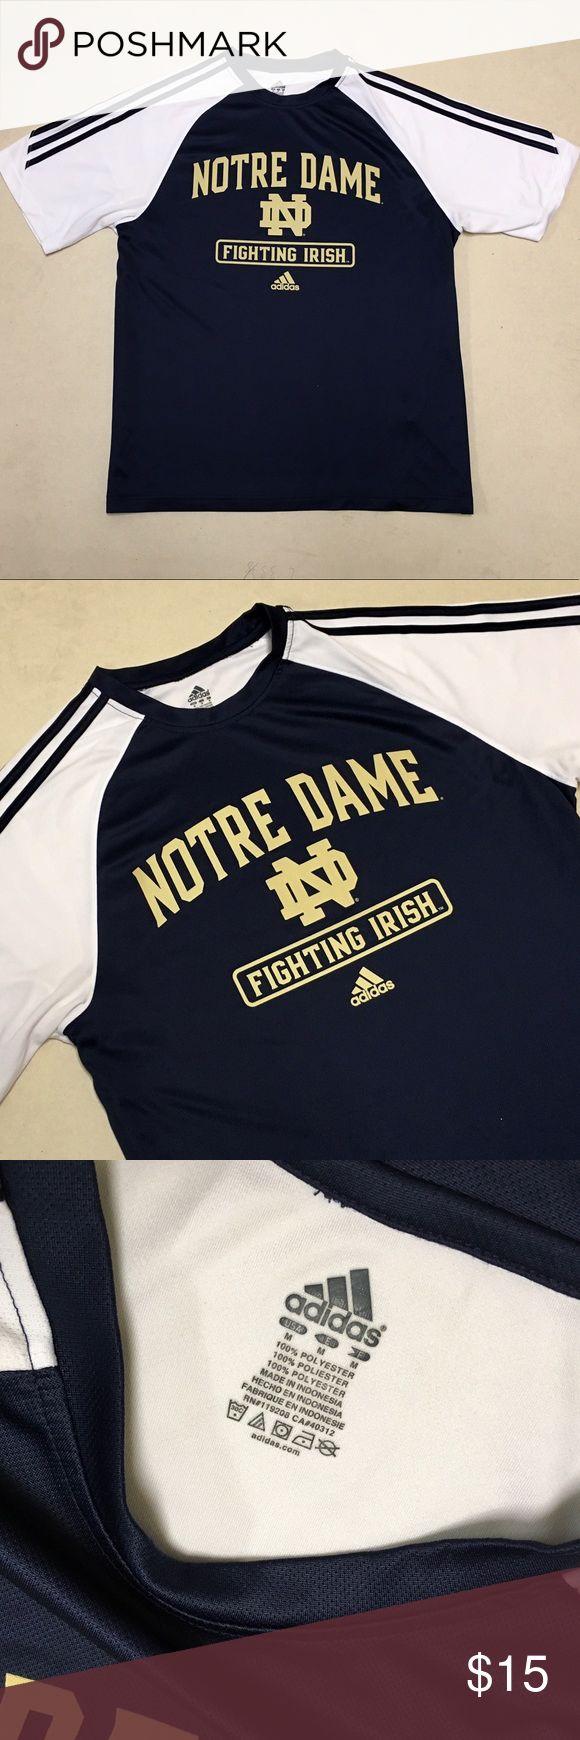 Notre Dame - Adidas Men's Athletic Shirt ☘️ Notre Dame Fighting Irish  Adidas Athletic Shirt   Size Men's Medium  Like new condition!!   ☘️☘️☘️ Adidas Shirts Tees - Short Sleeve